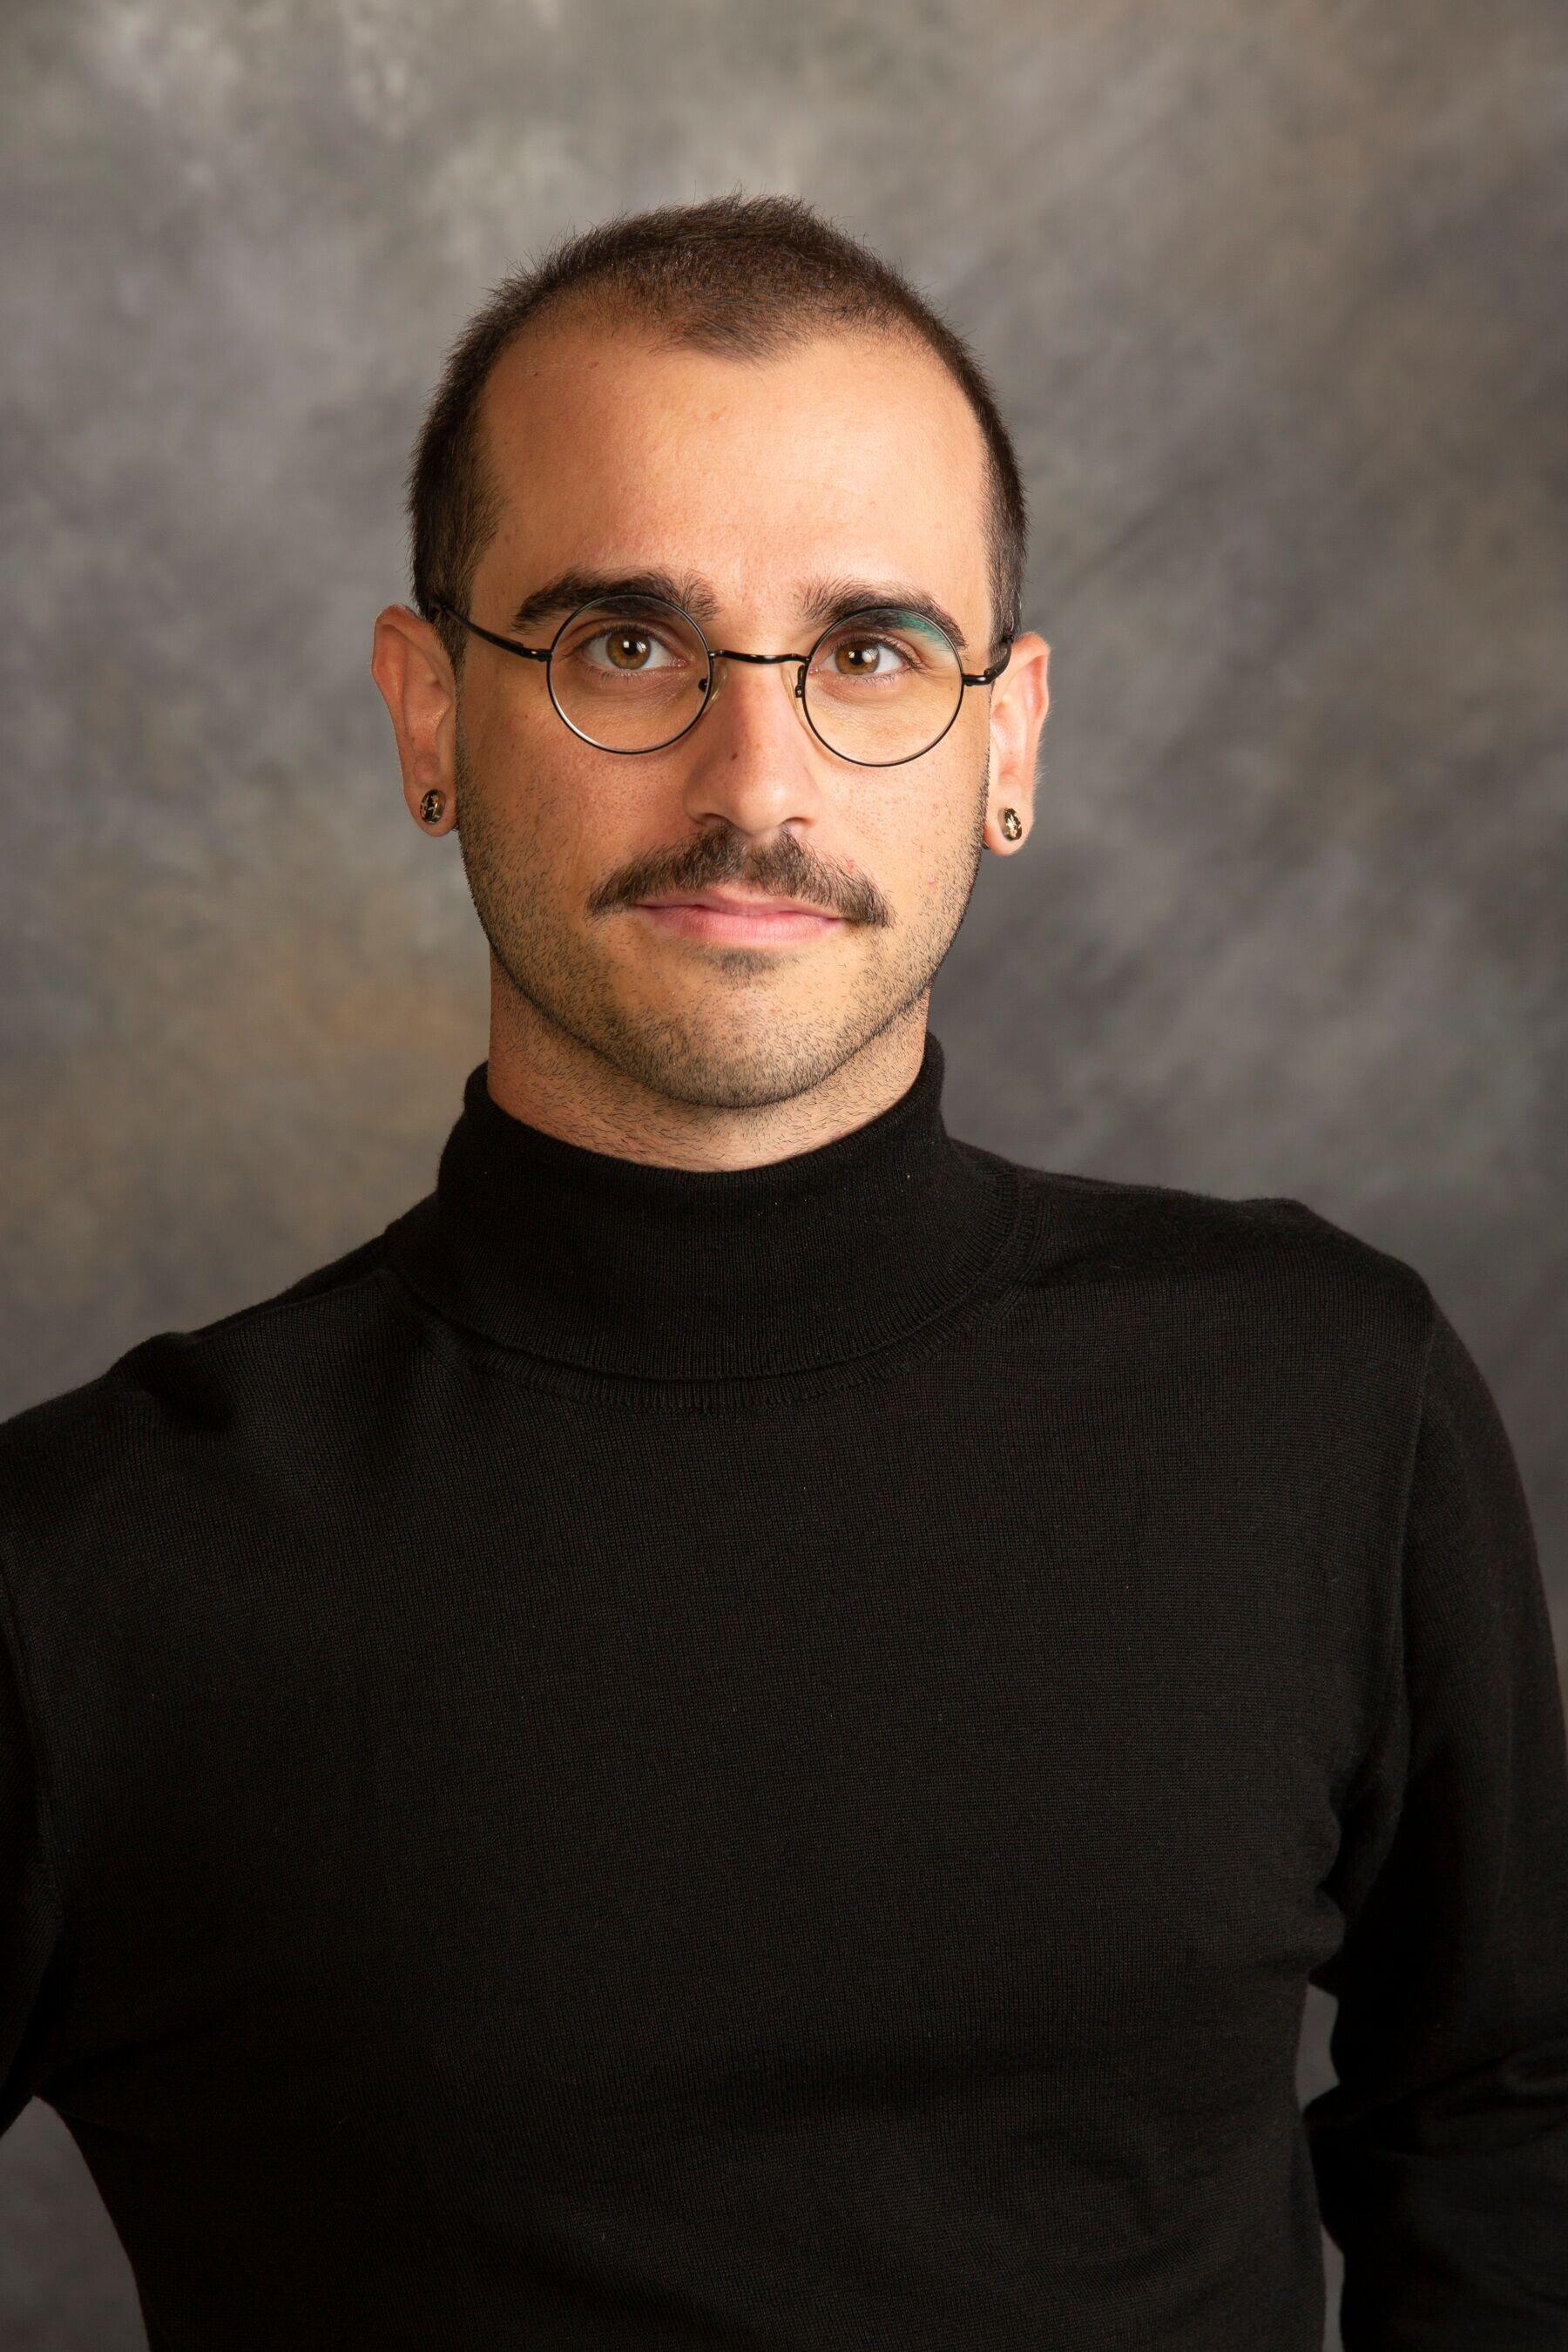 Dylan Morrongiello